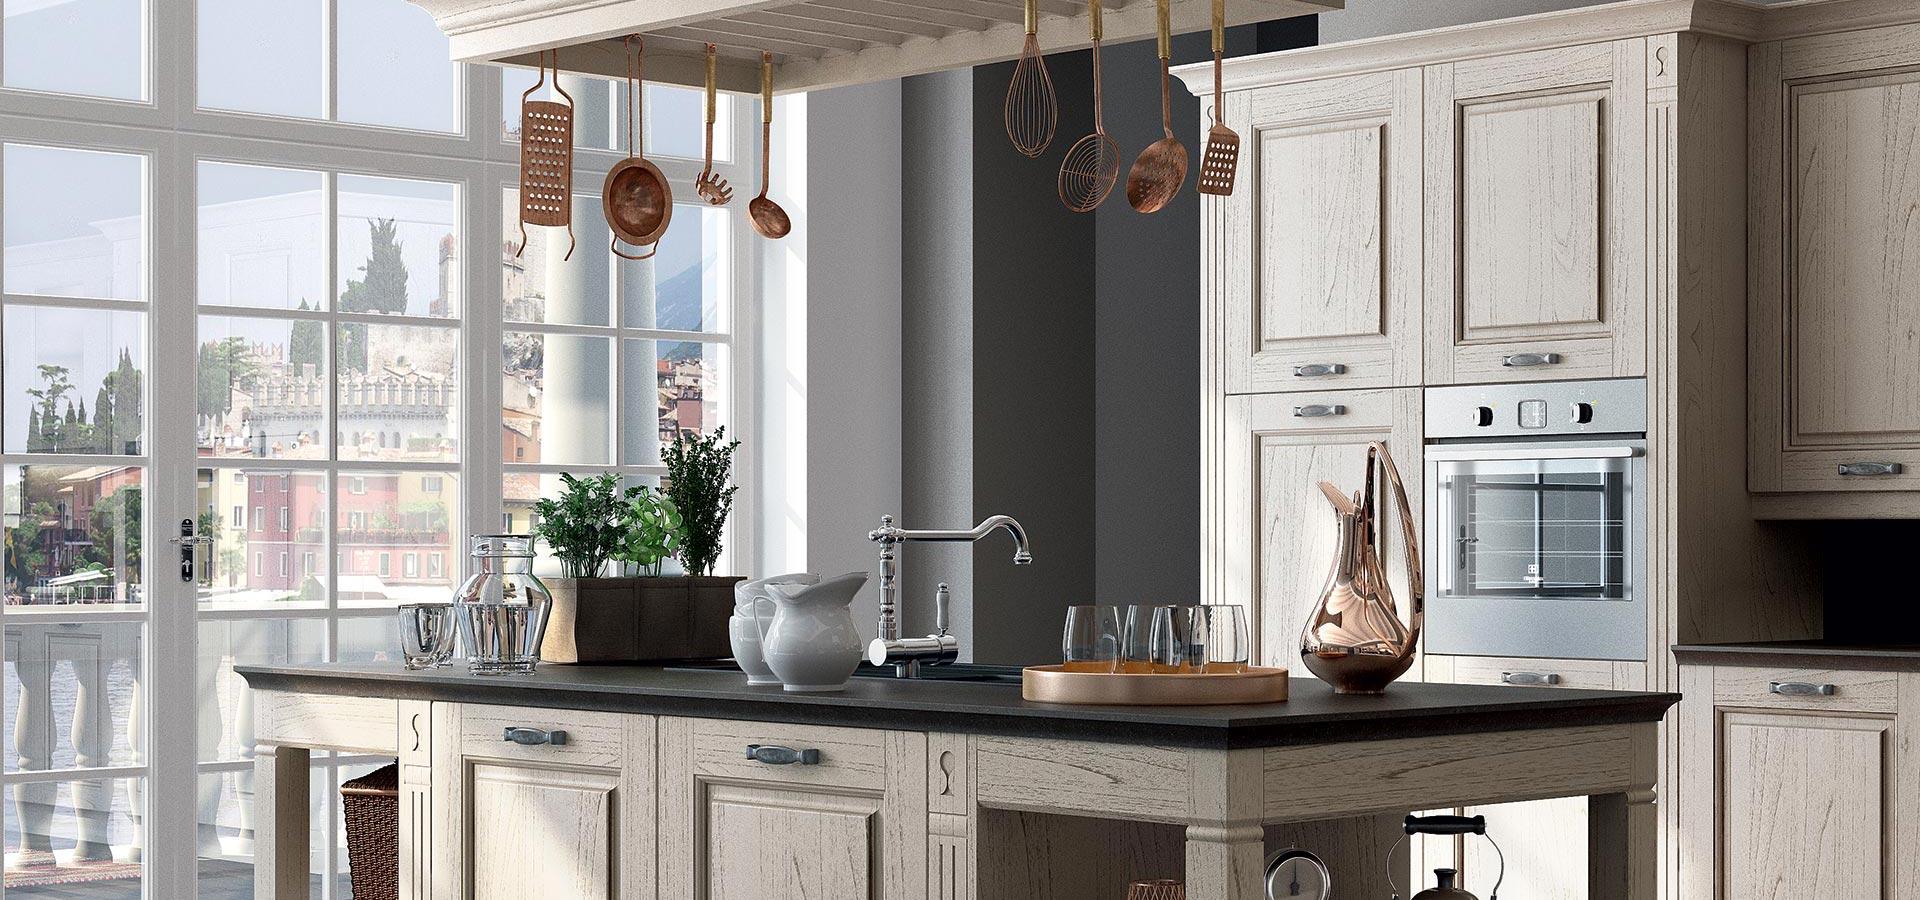 Arredamenti cucine classiche e moderne minoia arreda for Meka arredamenti cucine